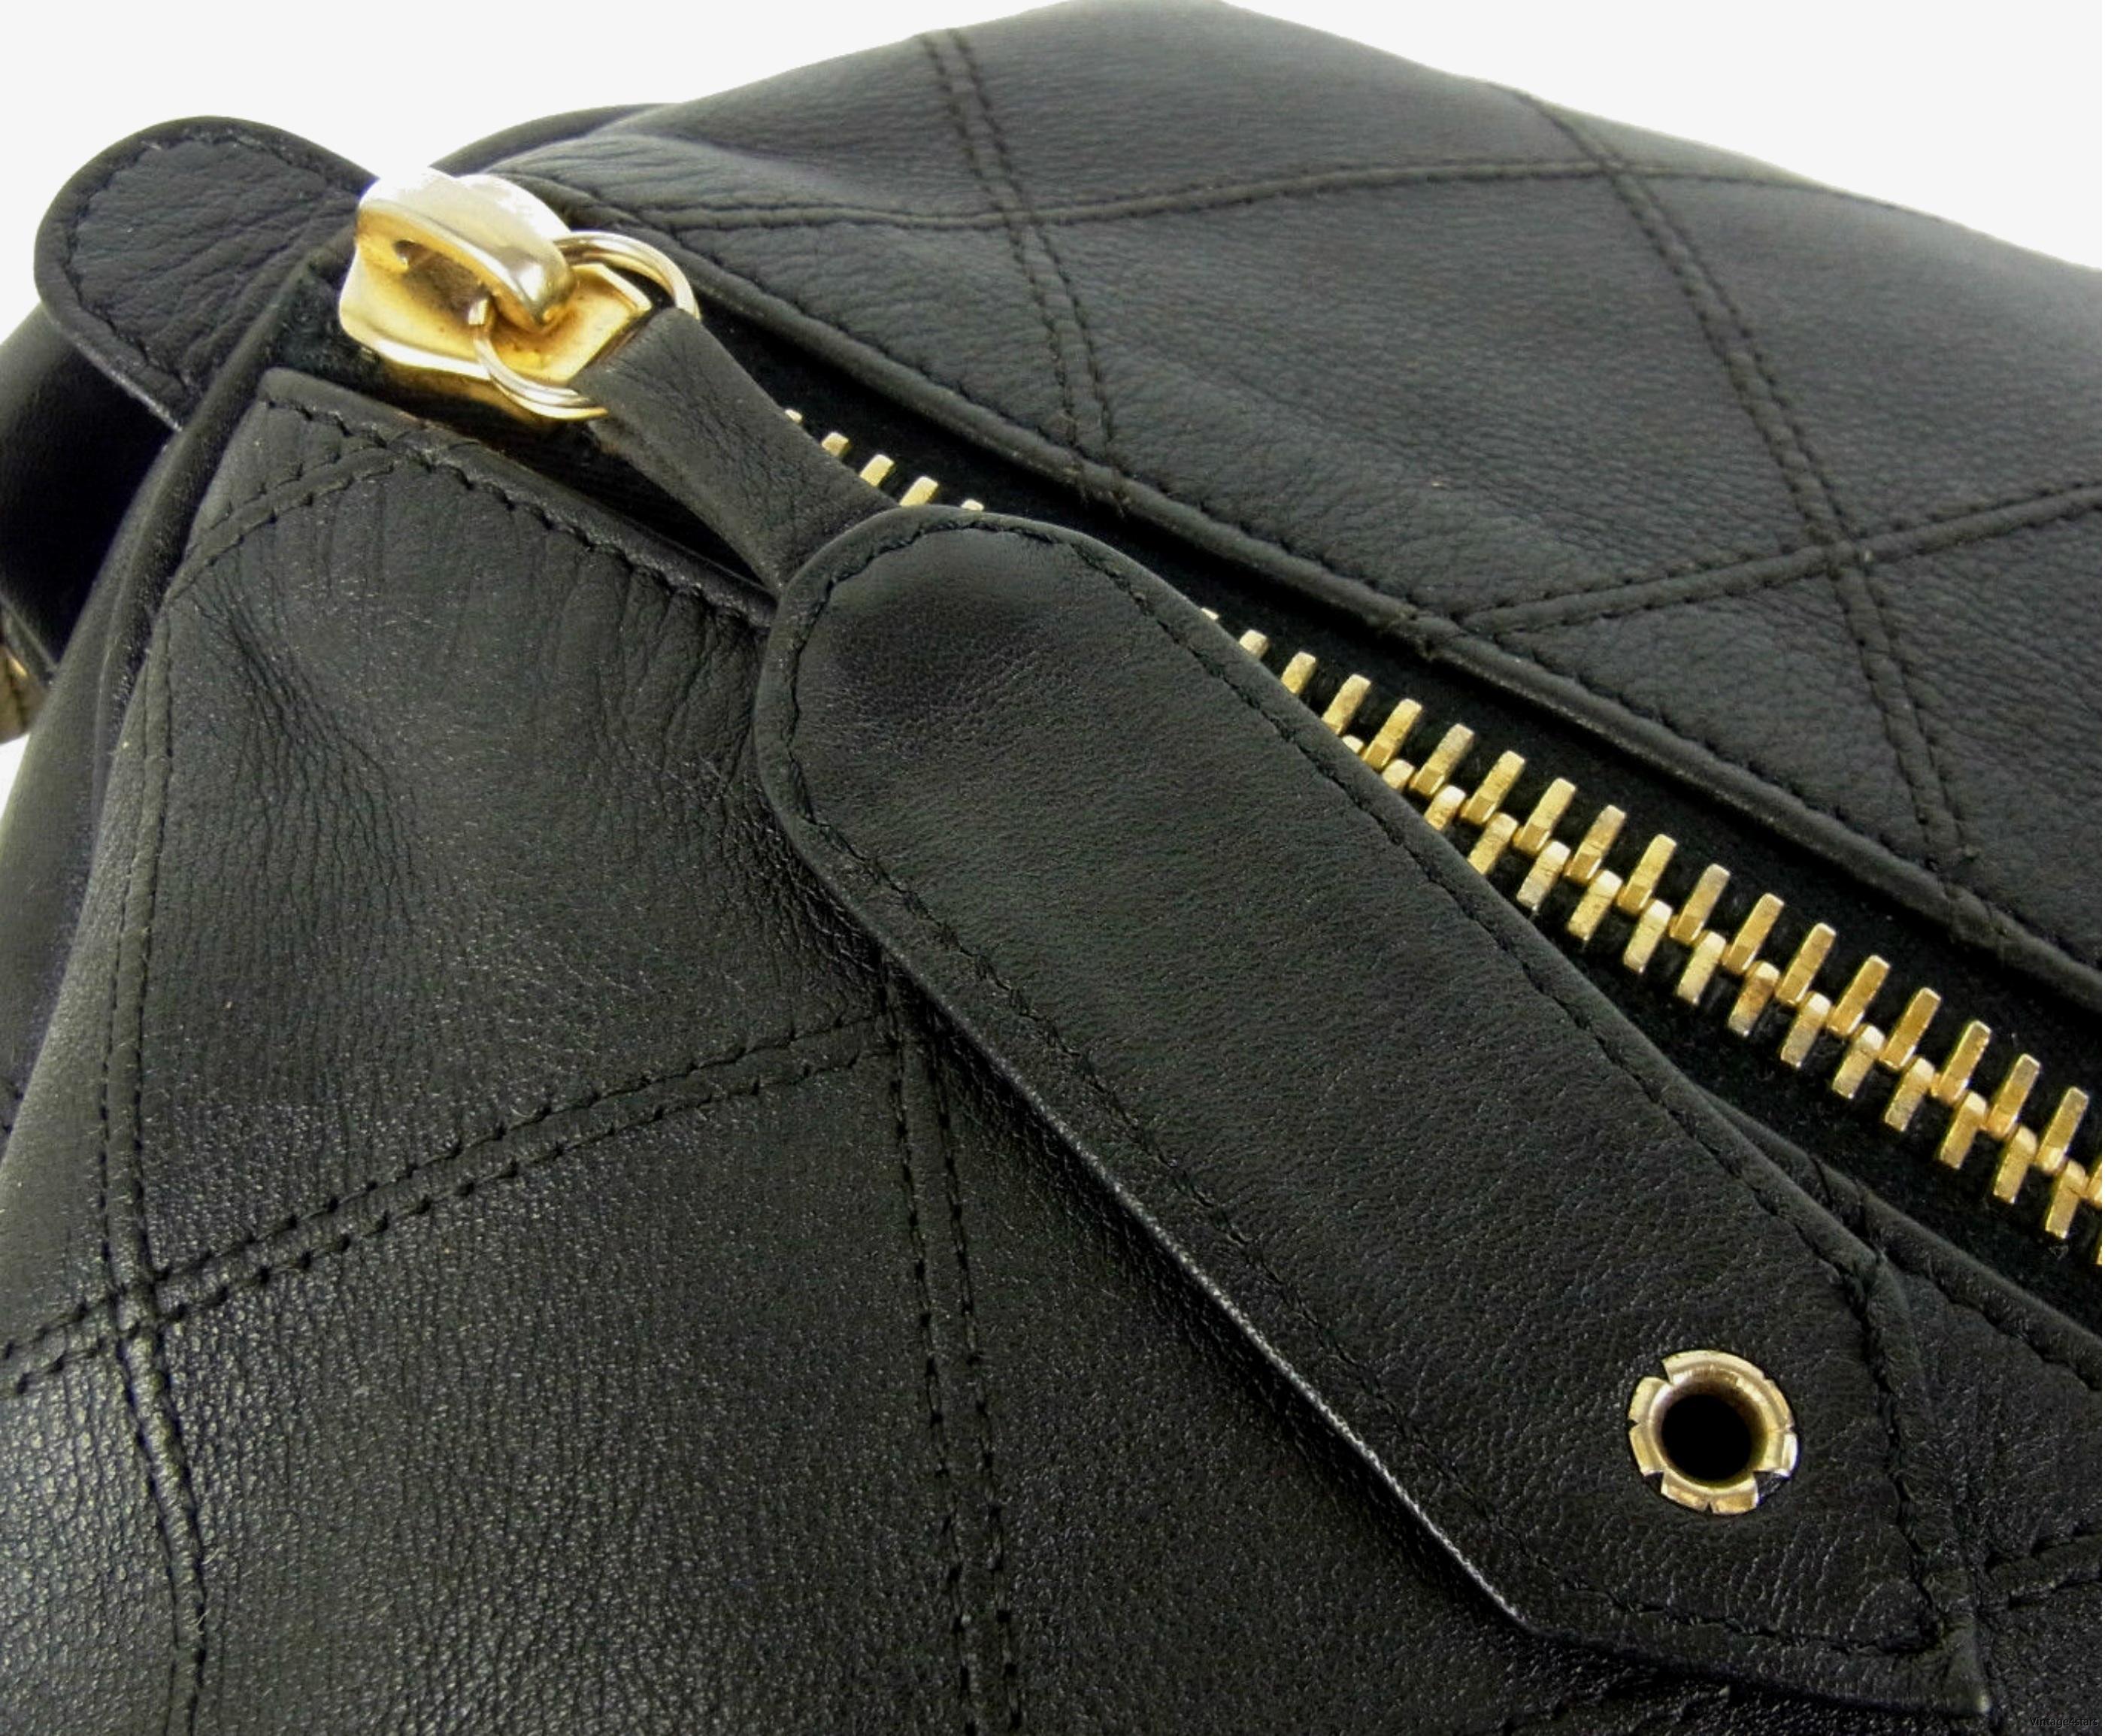 CHANEL Duffle Bag Qulited Calfskin 10